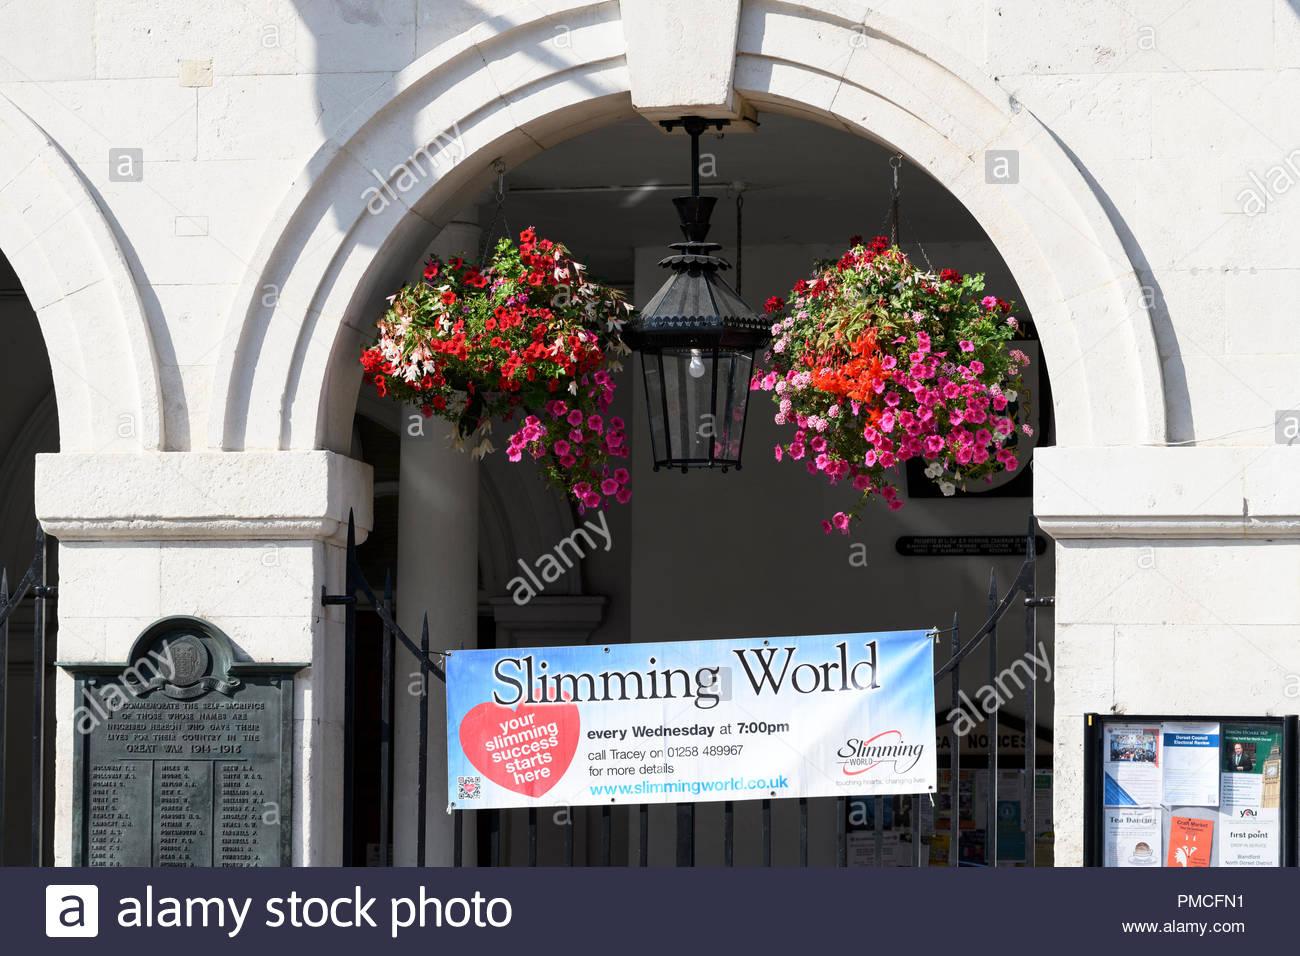 Town hall  Slimming World venue, Blandford, Dorset, England, UK - Stock Image